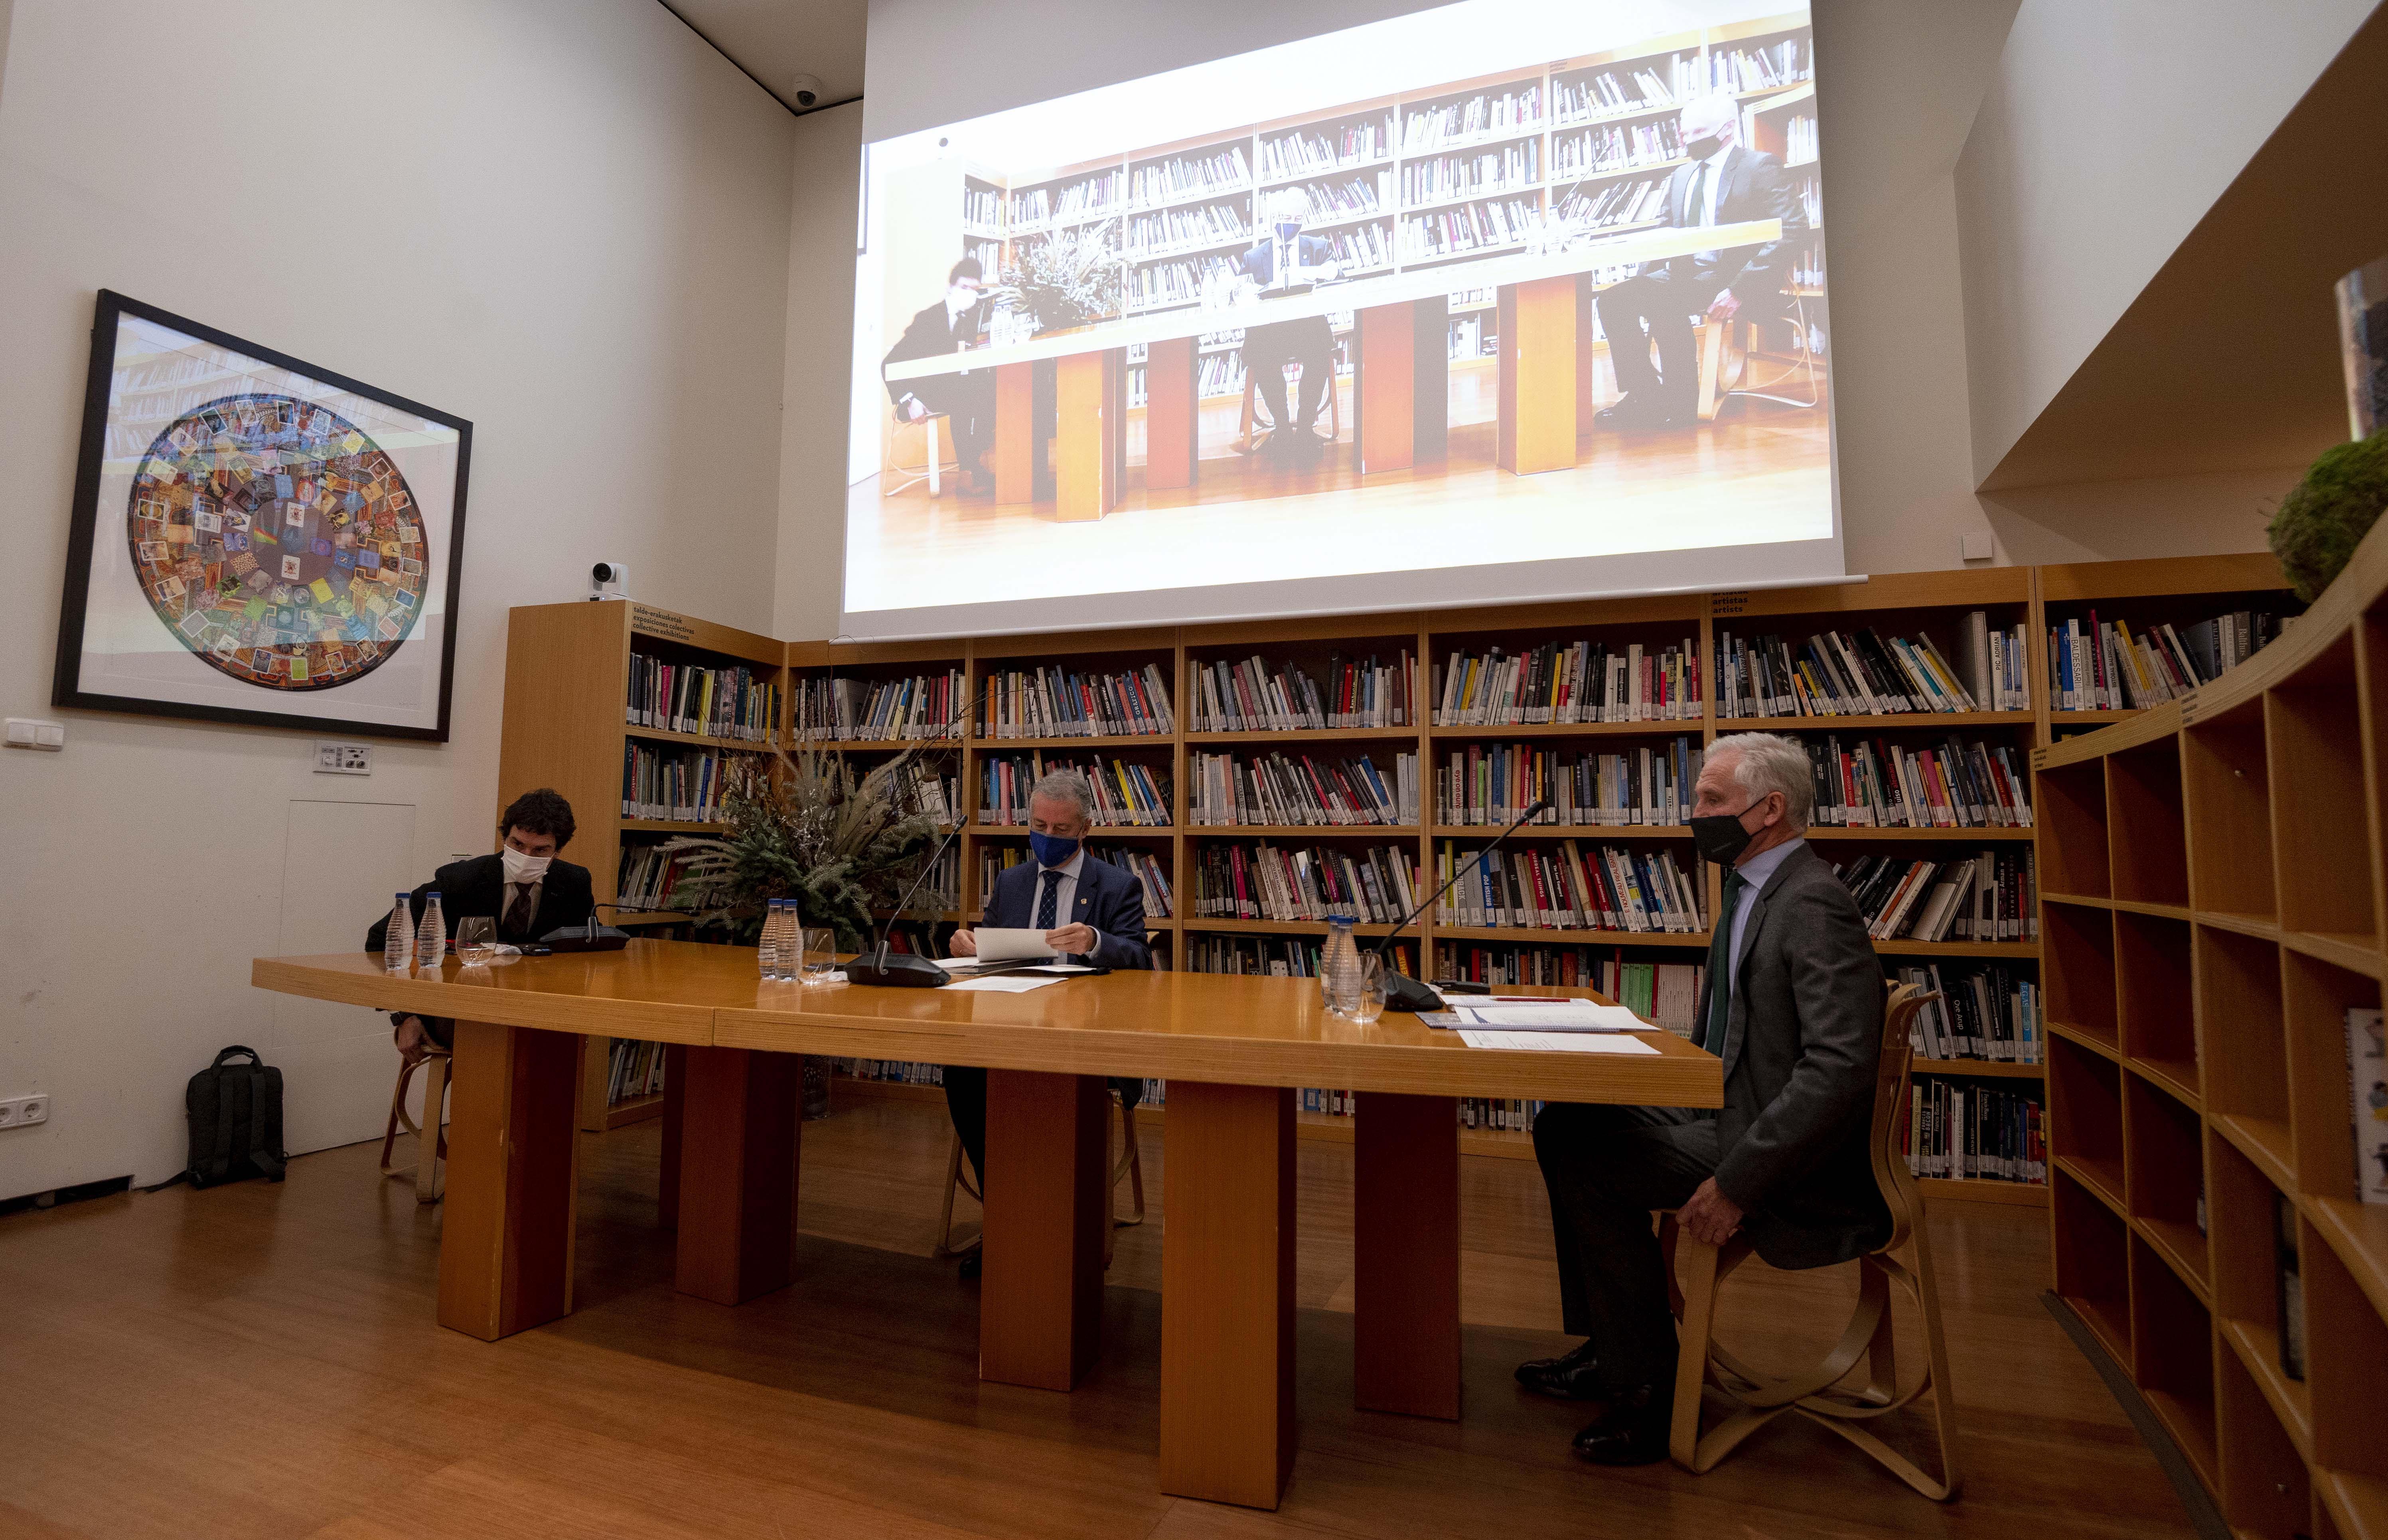 El Lehendakari preside la reunión del Patronato del Museo Guggenheim de Bilbao [1:20]